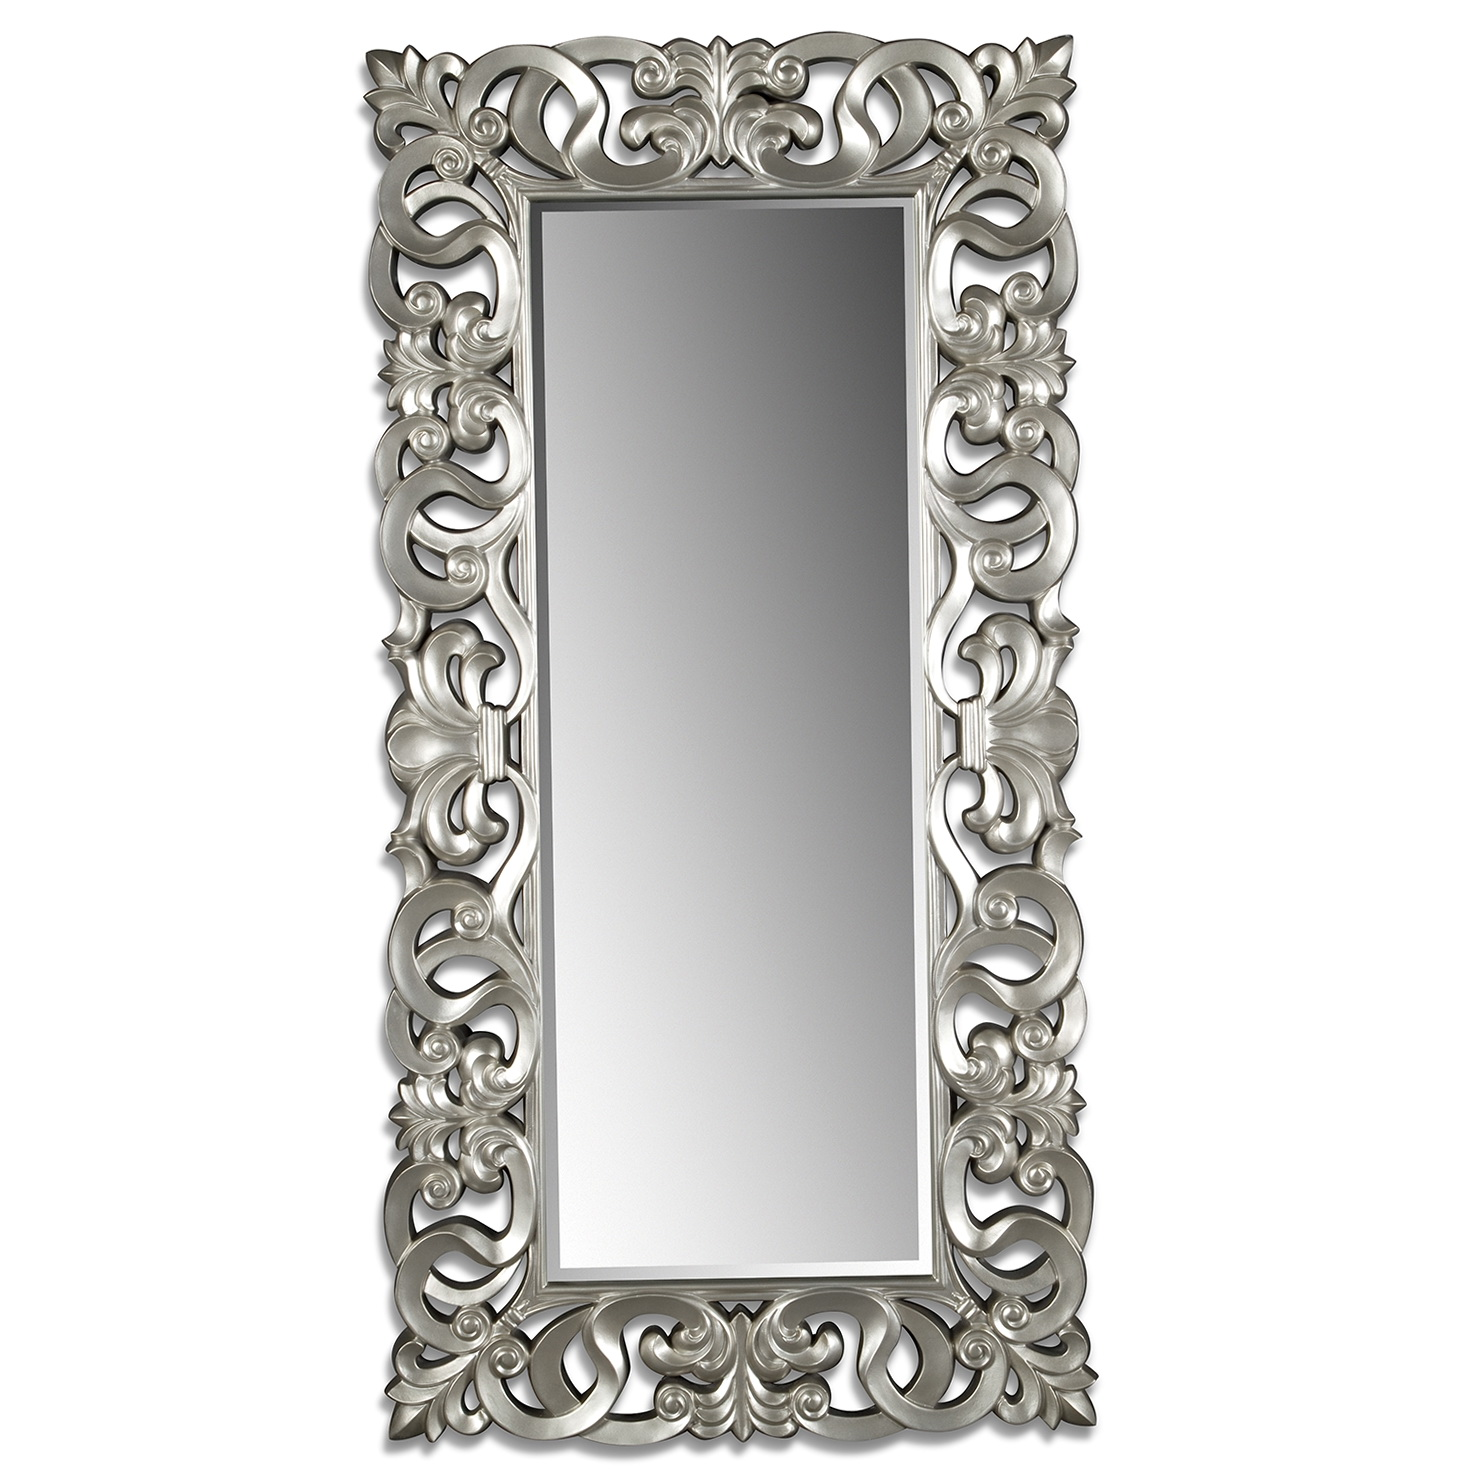 Silver Wall Mirrors Decorative